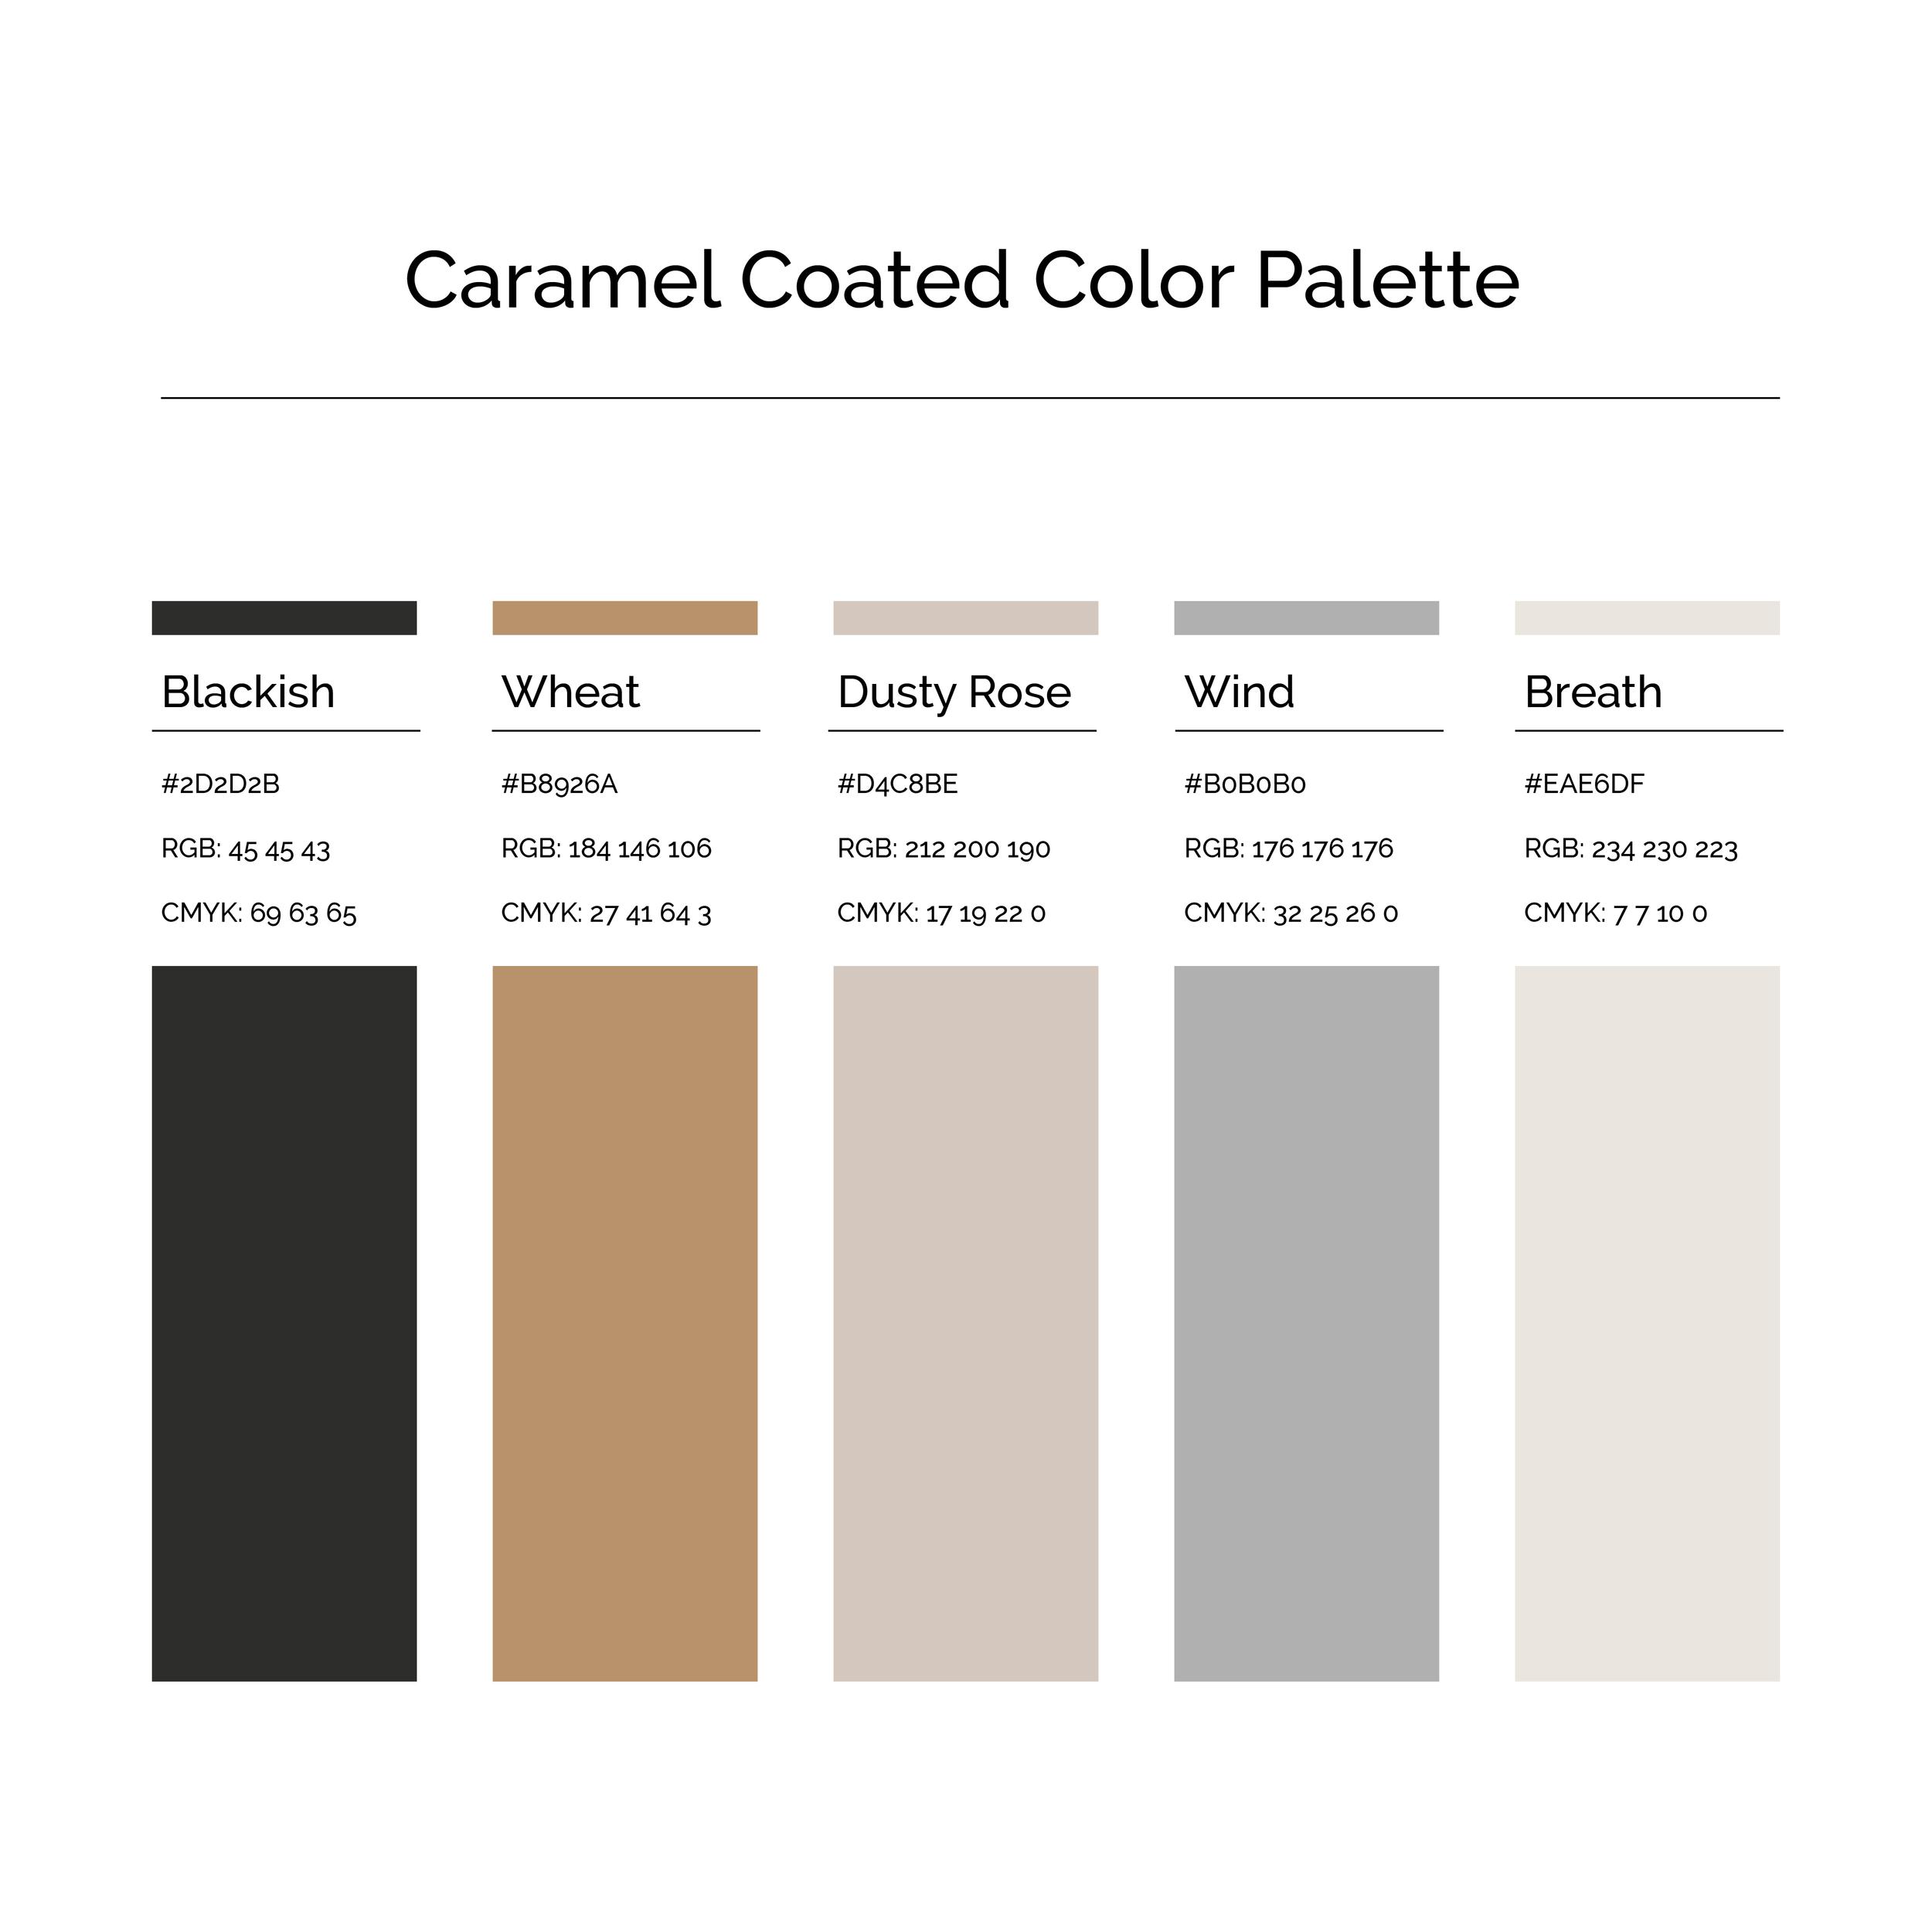 15 More Color Palettes | Caramel Coated Color Palette